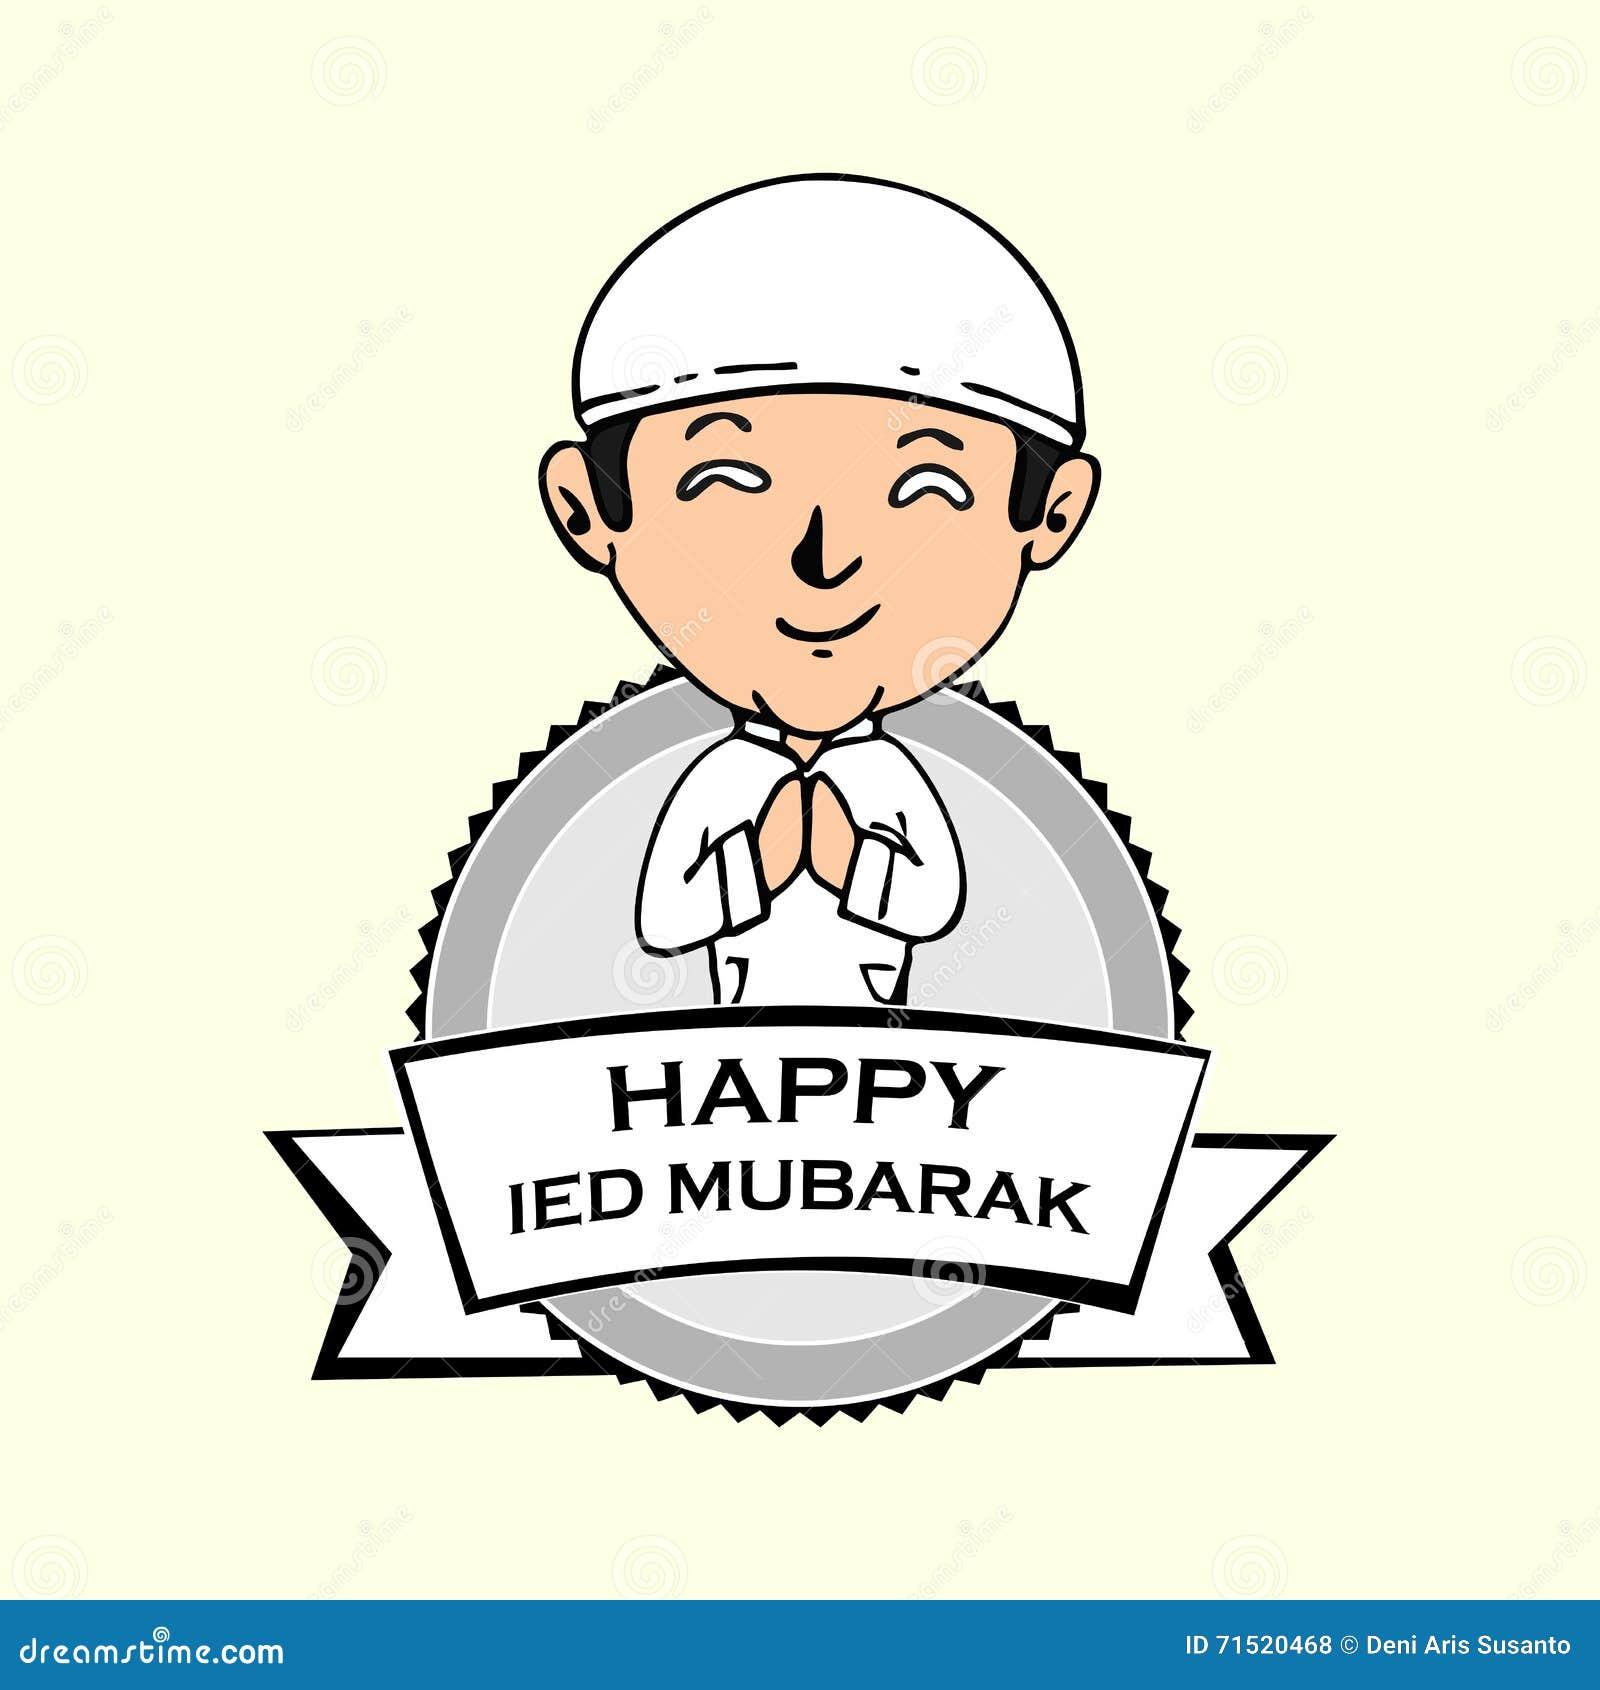 Happy Ied Mubarak Cartoon Stock Vector. Illustration Of